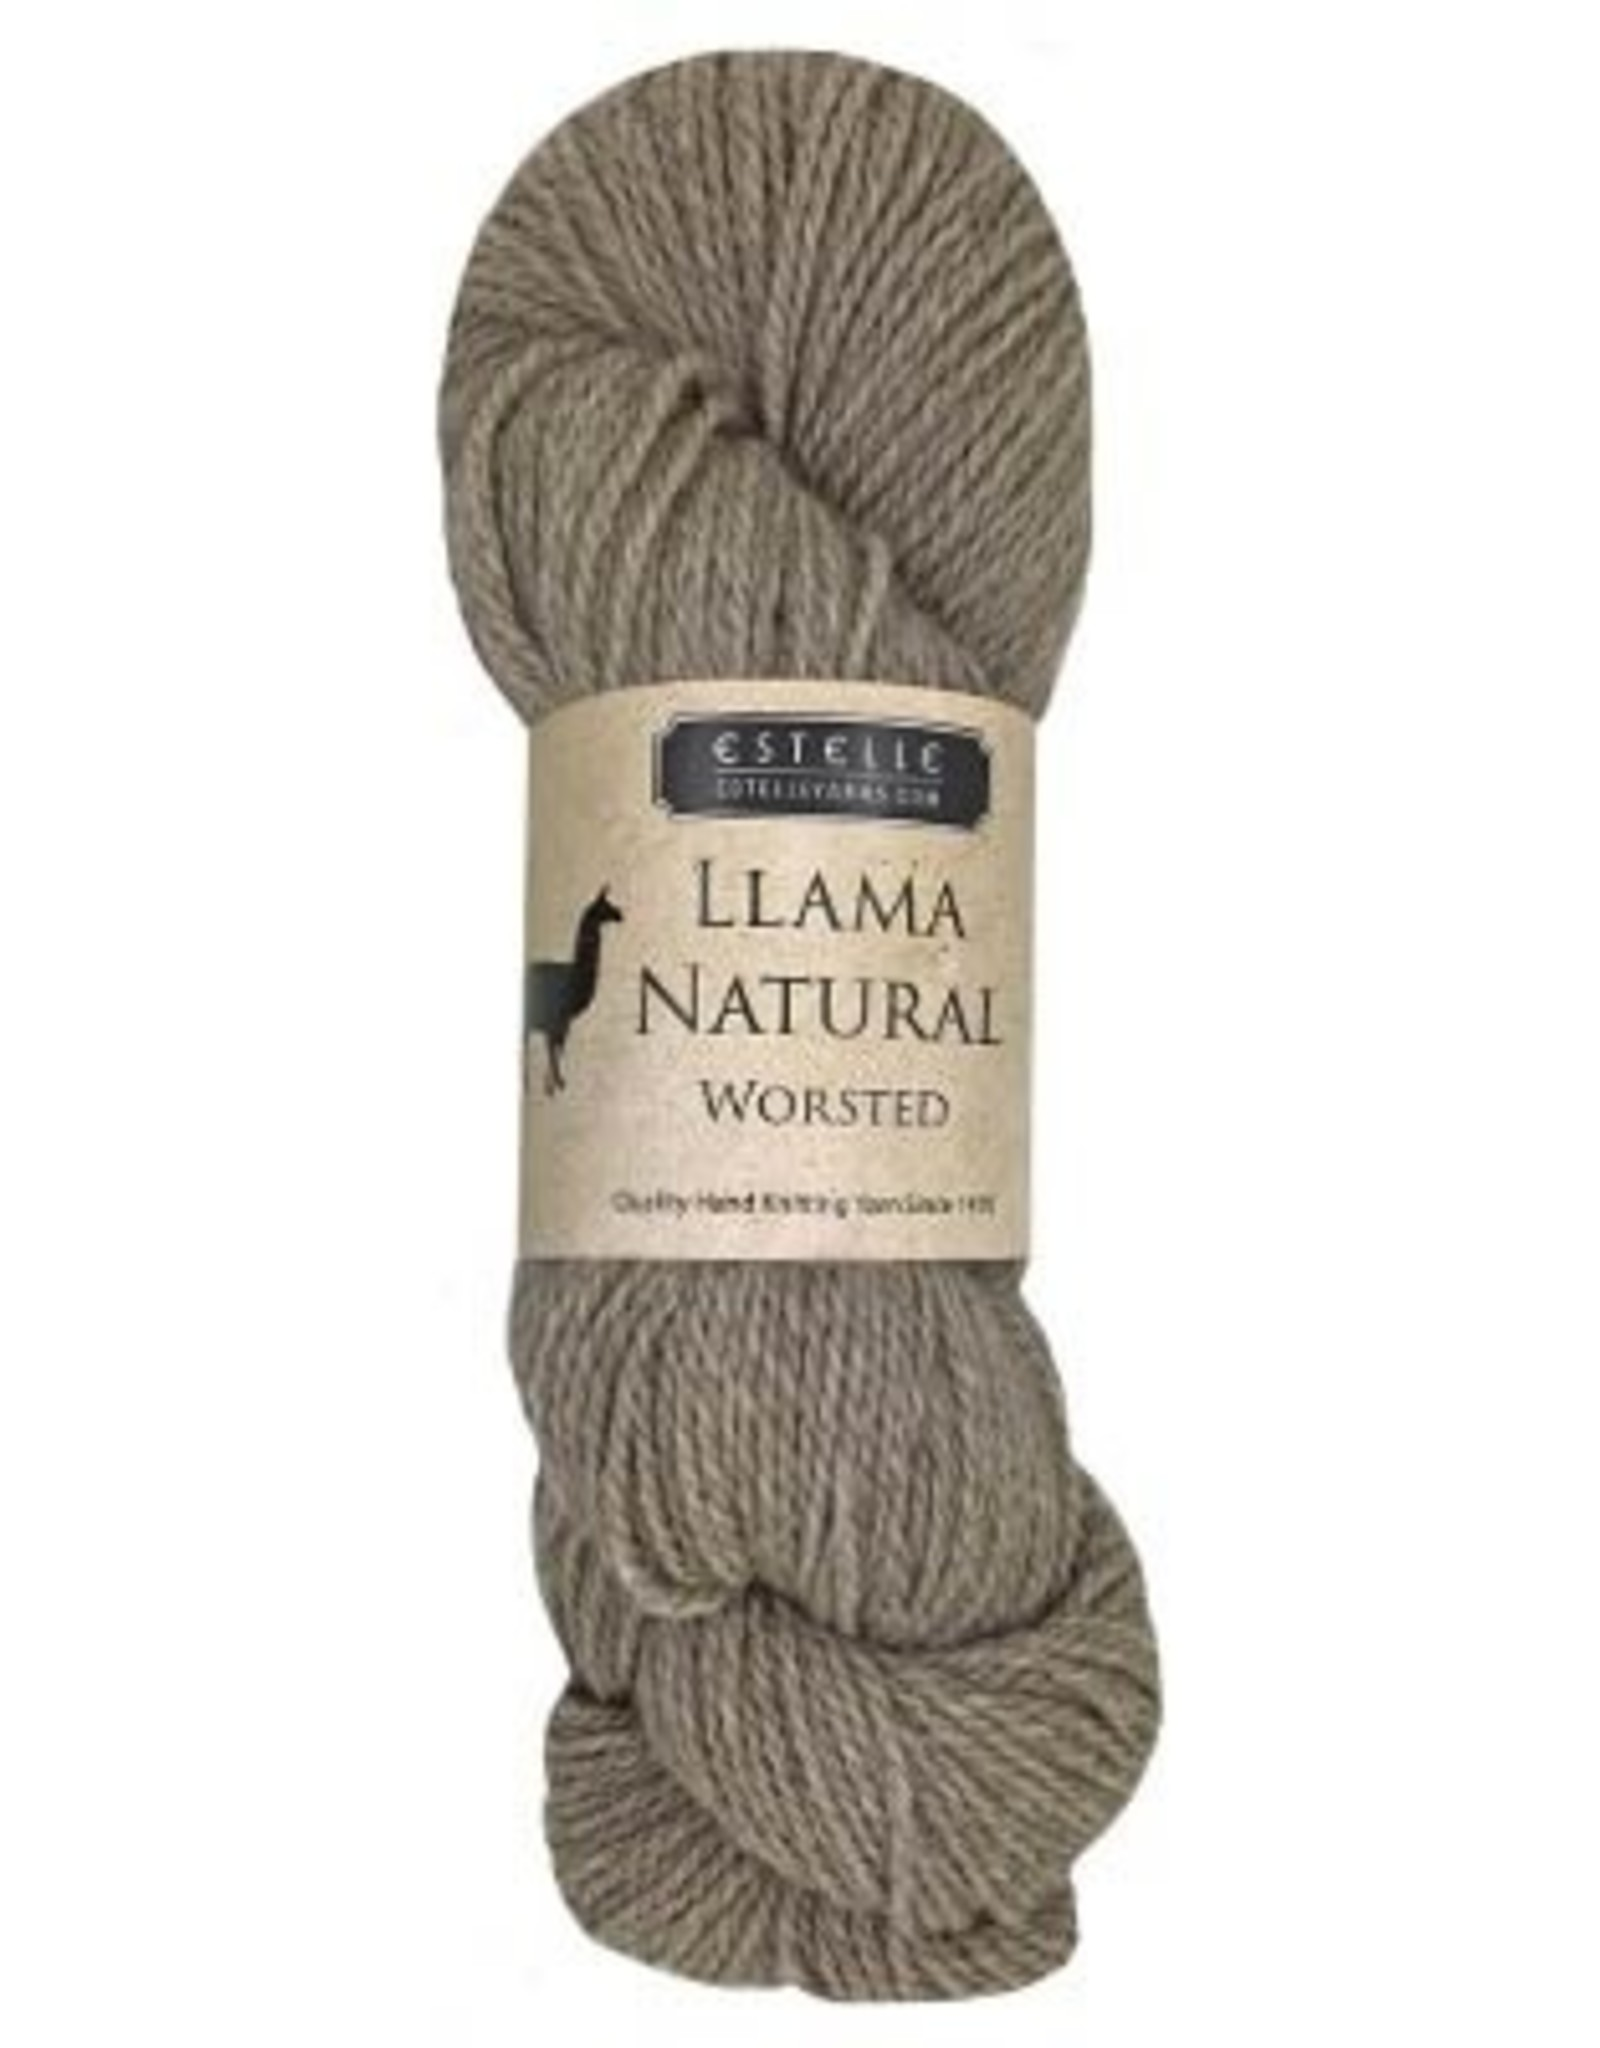 Estelle Yarns Llama Natural Worsted - Fawn